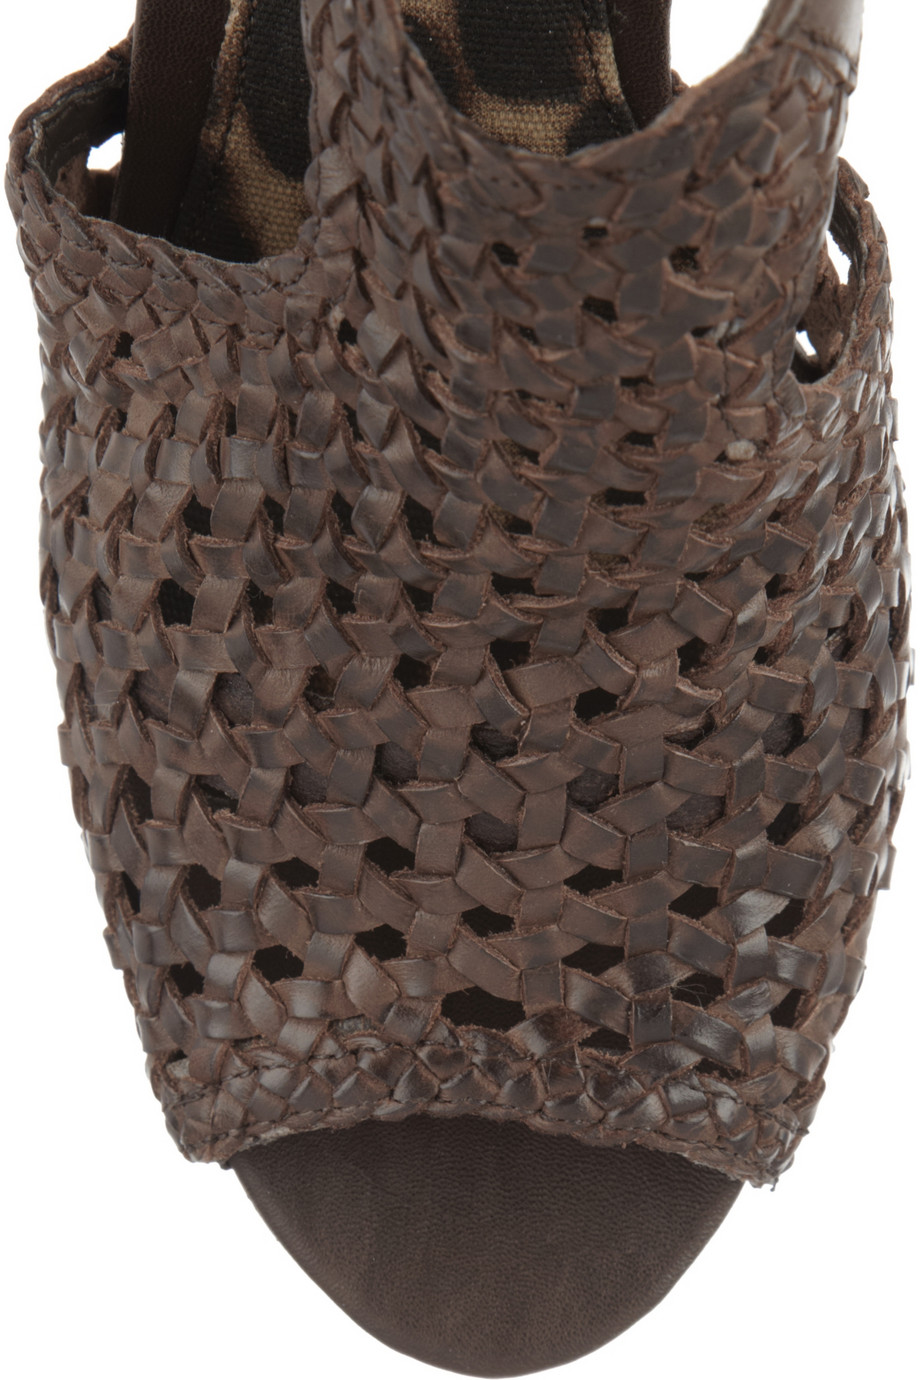 b4dd91efe741 Lyst - Sam Edelman Kasi Woven Leather Wedge Sandals in Brown